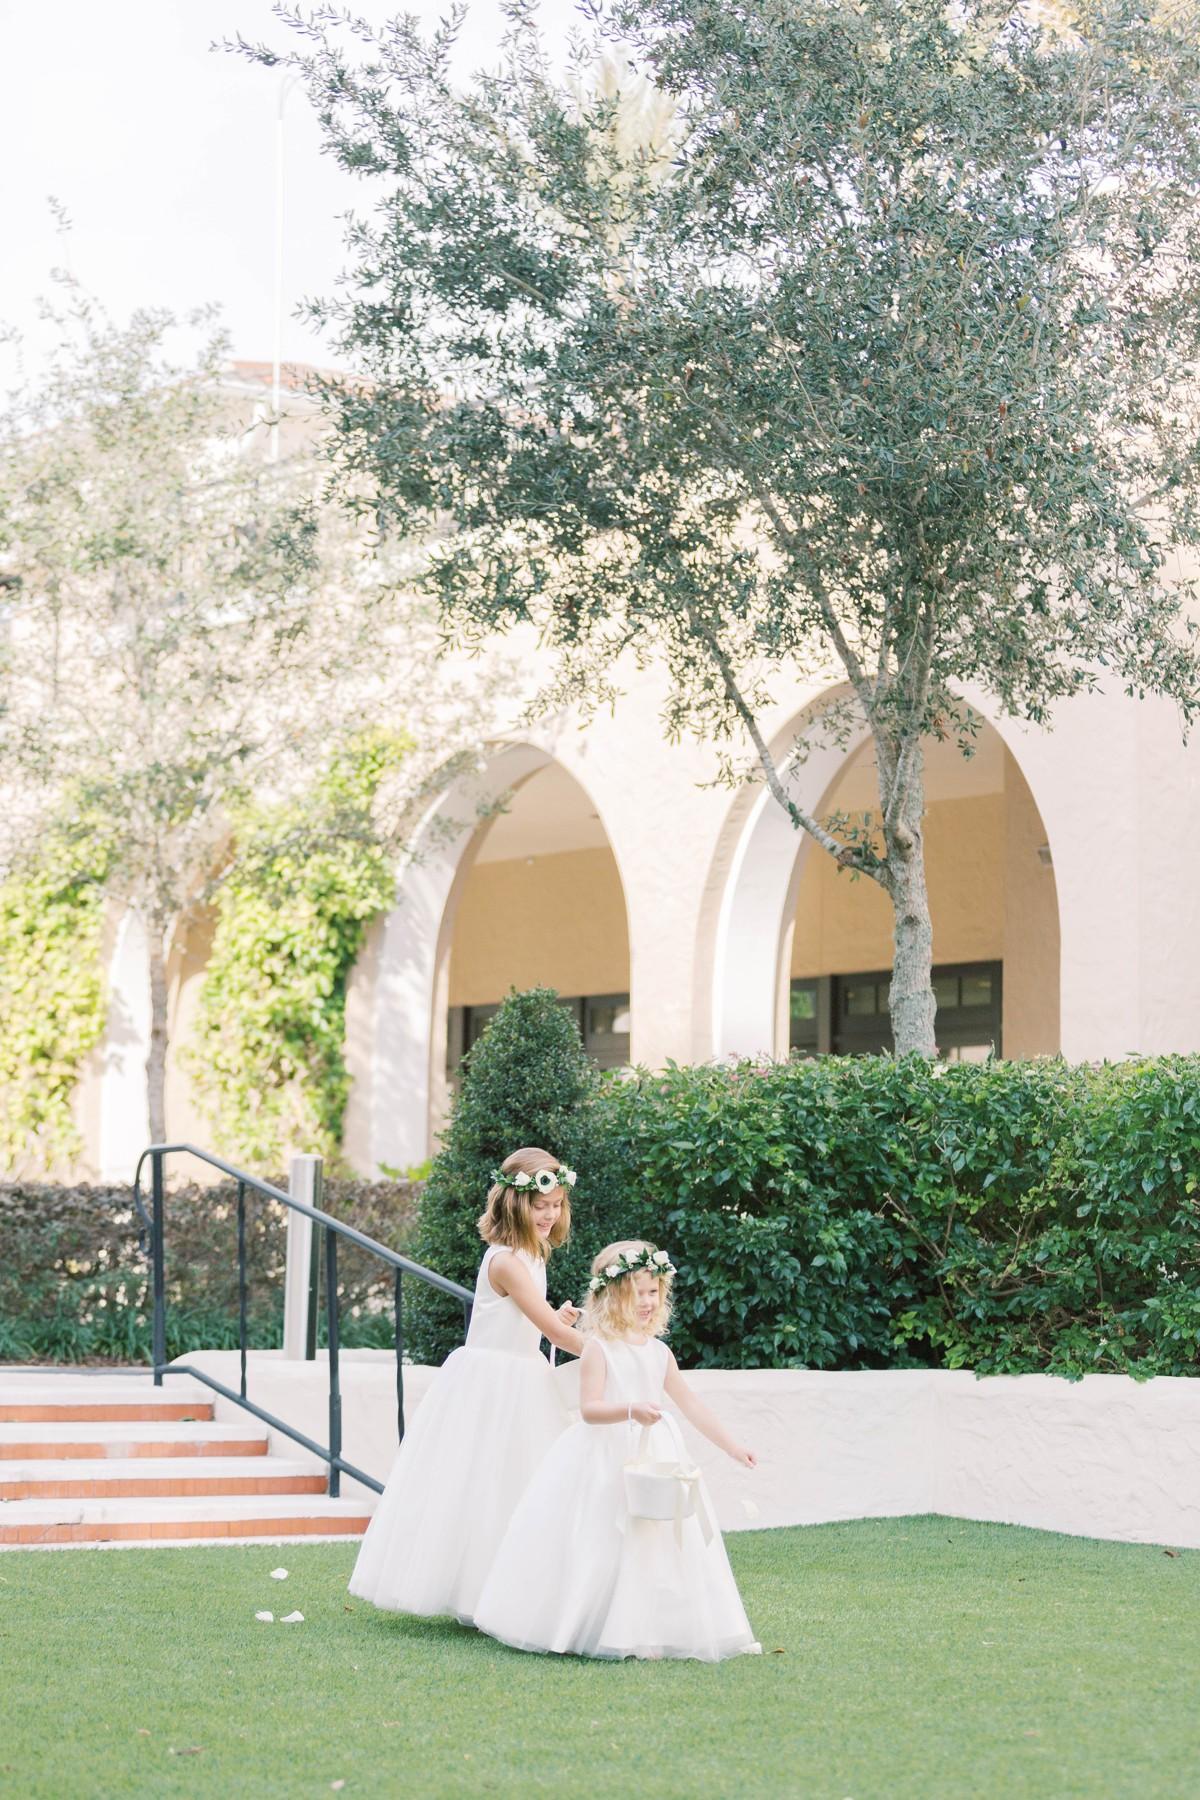 Alfond-Inn-Wedding-Winter-Park-Wedding-Photographer-Chantell-Rae-Photography_0034.jpg